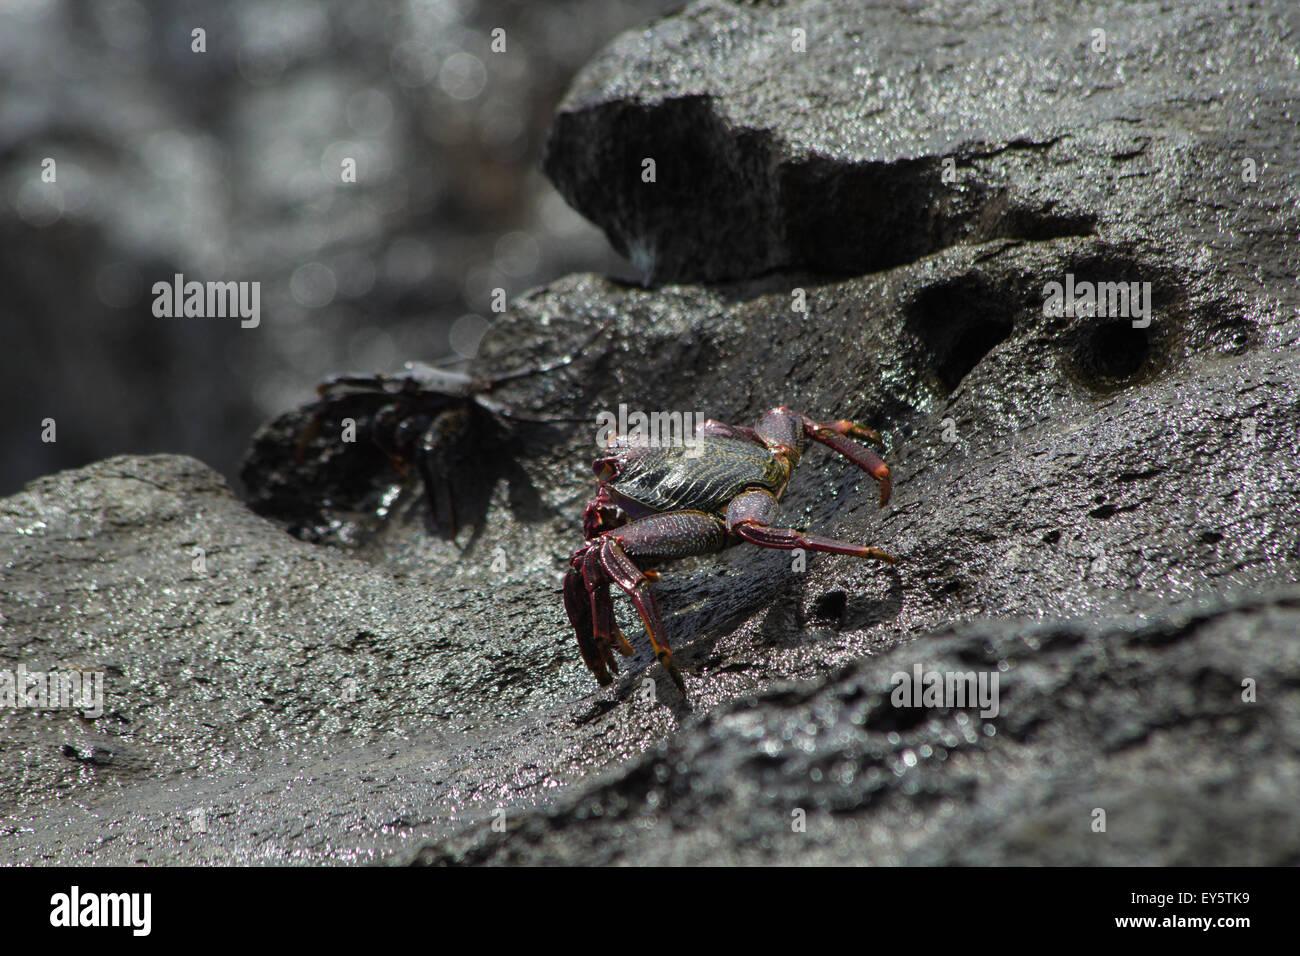 Atlantic Rock Crab ,Grapsus adscensionis on wet rocks Stock Photo